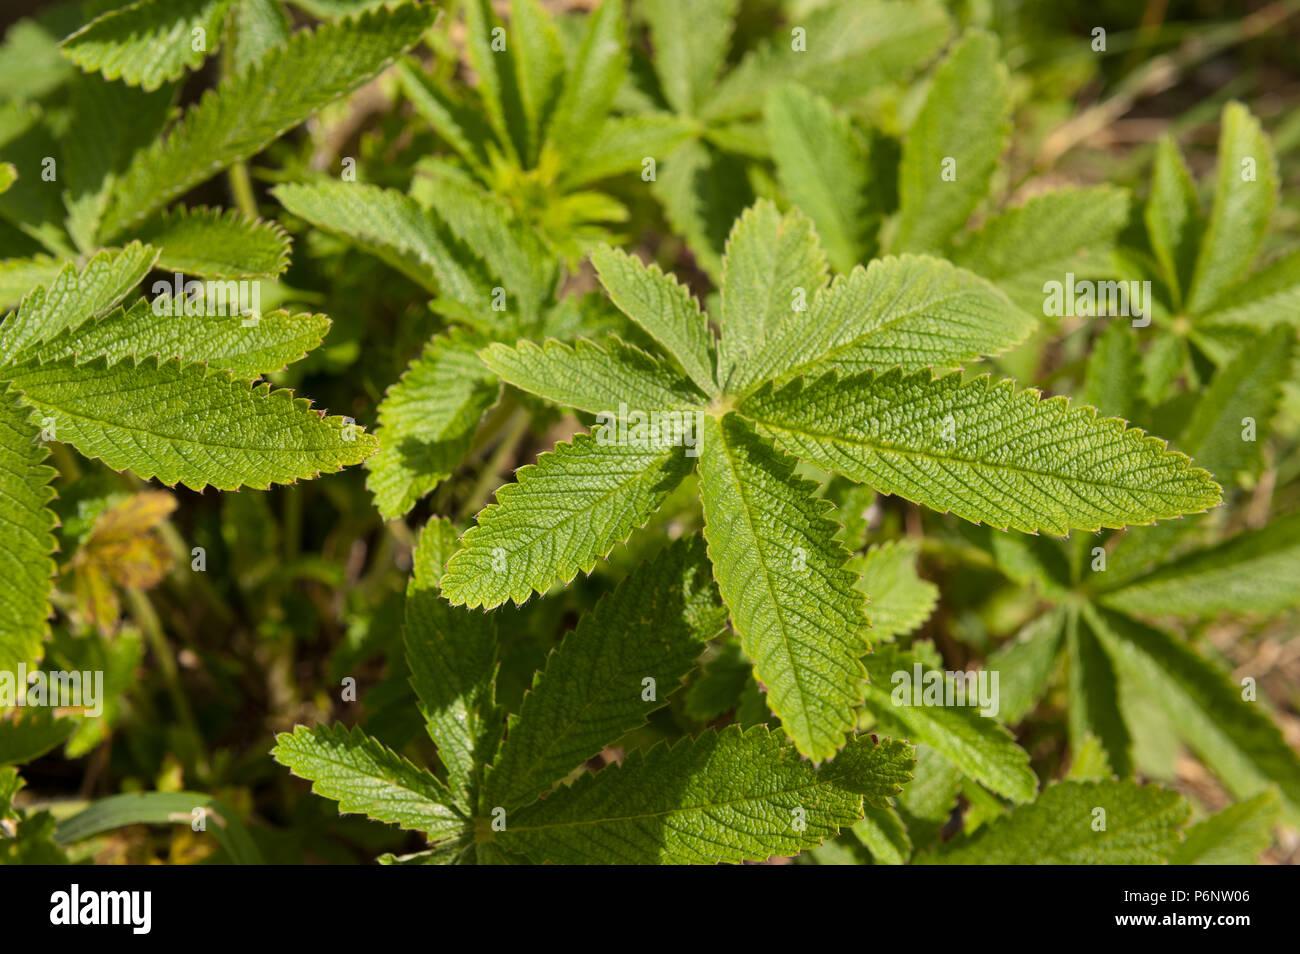 Cannabis Ruderalis Stock Photos & Cannabis Ruderalis Stock